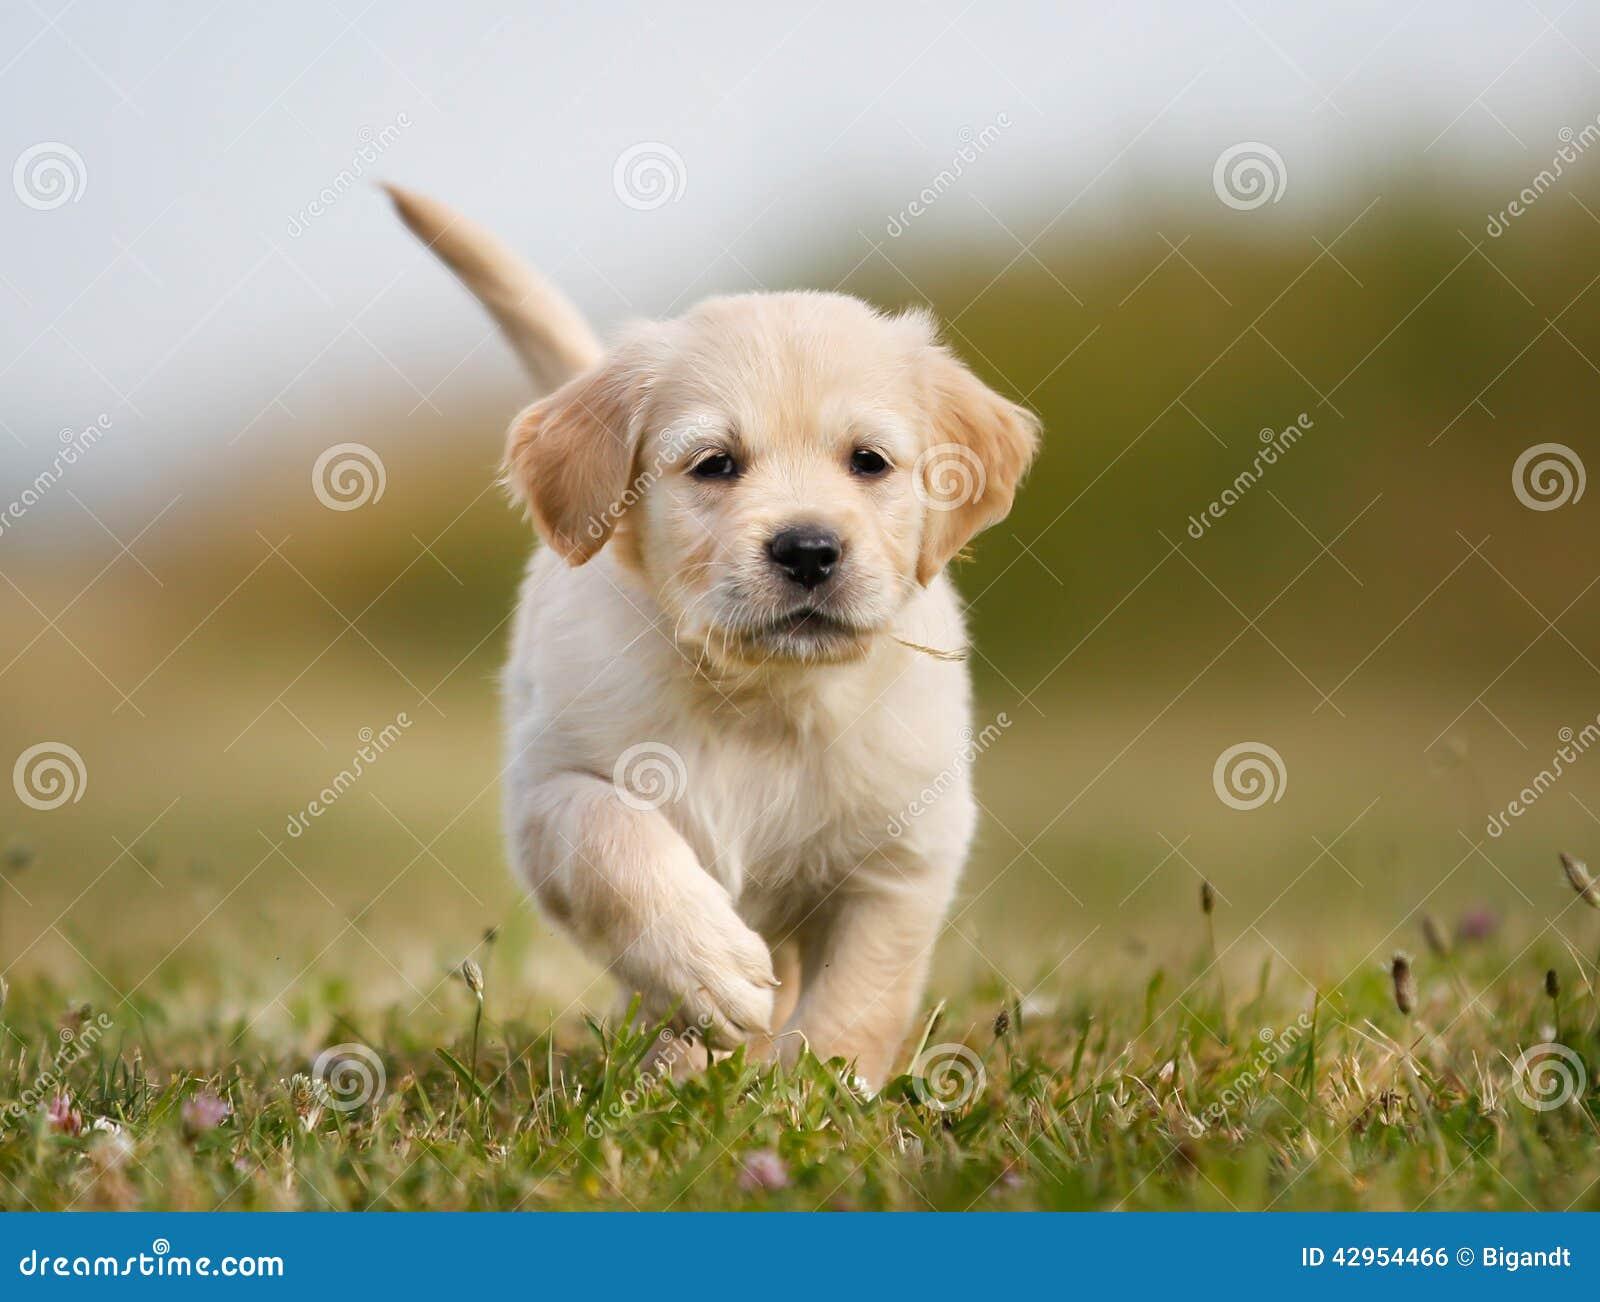 Golden Retriever Puppy Running Towards Camera Stock Photo Image Of